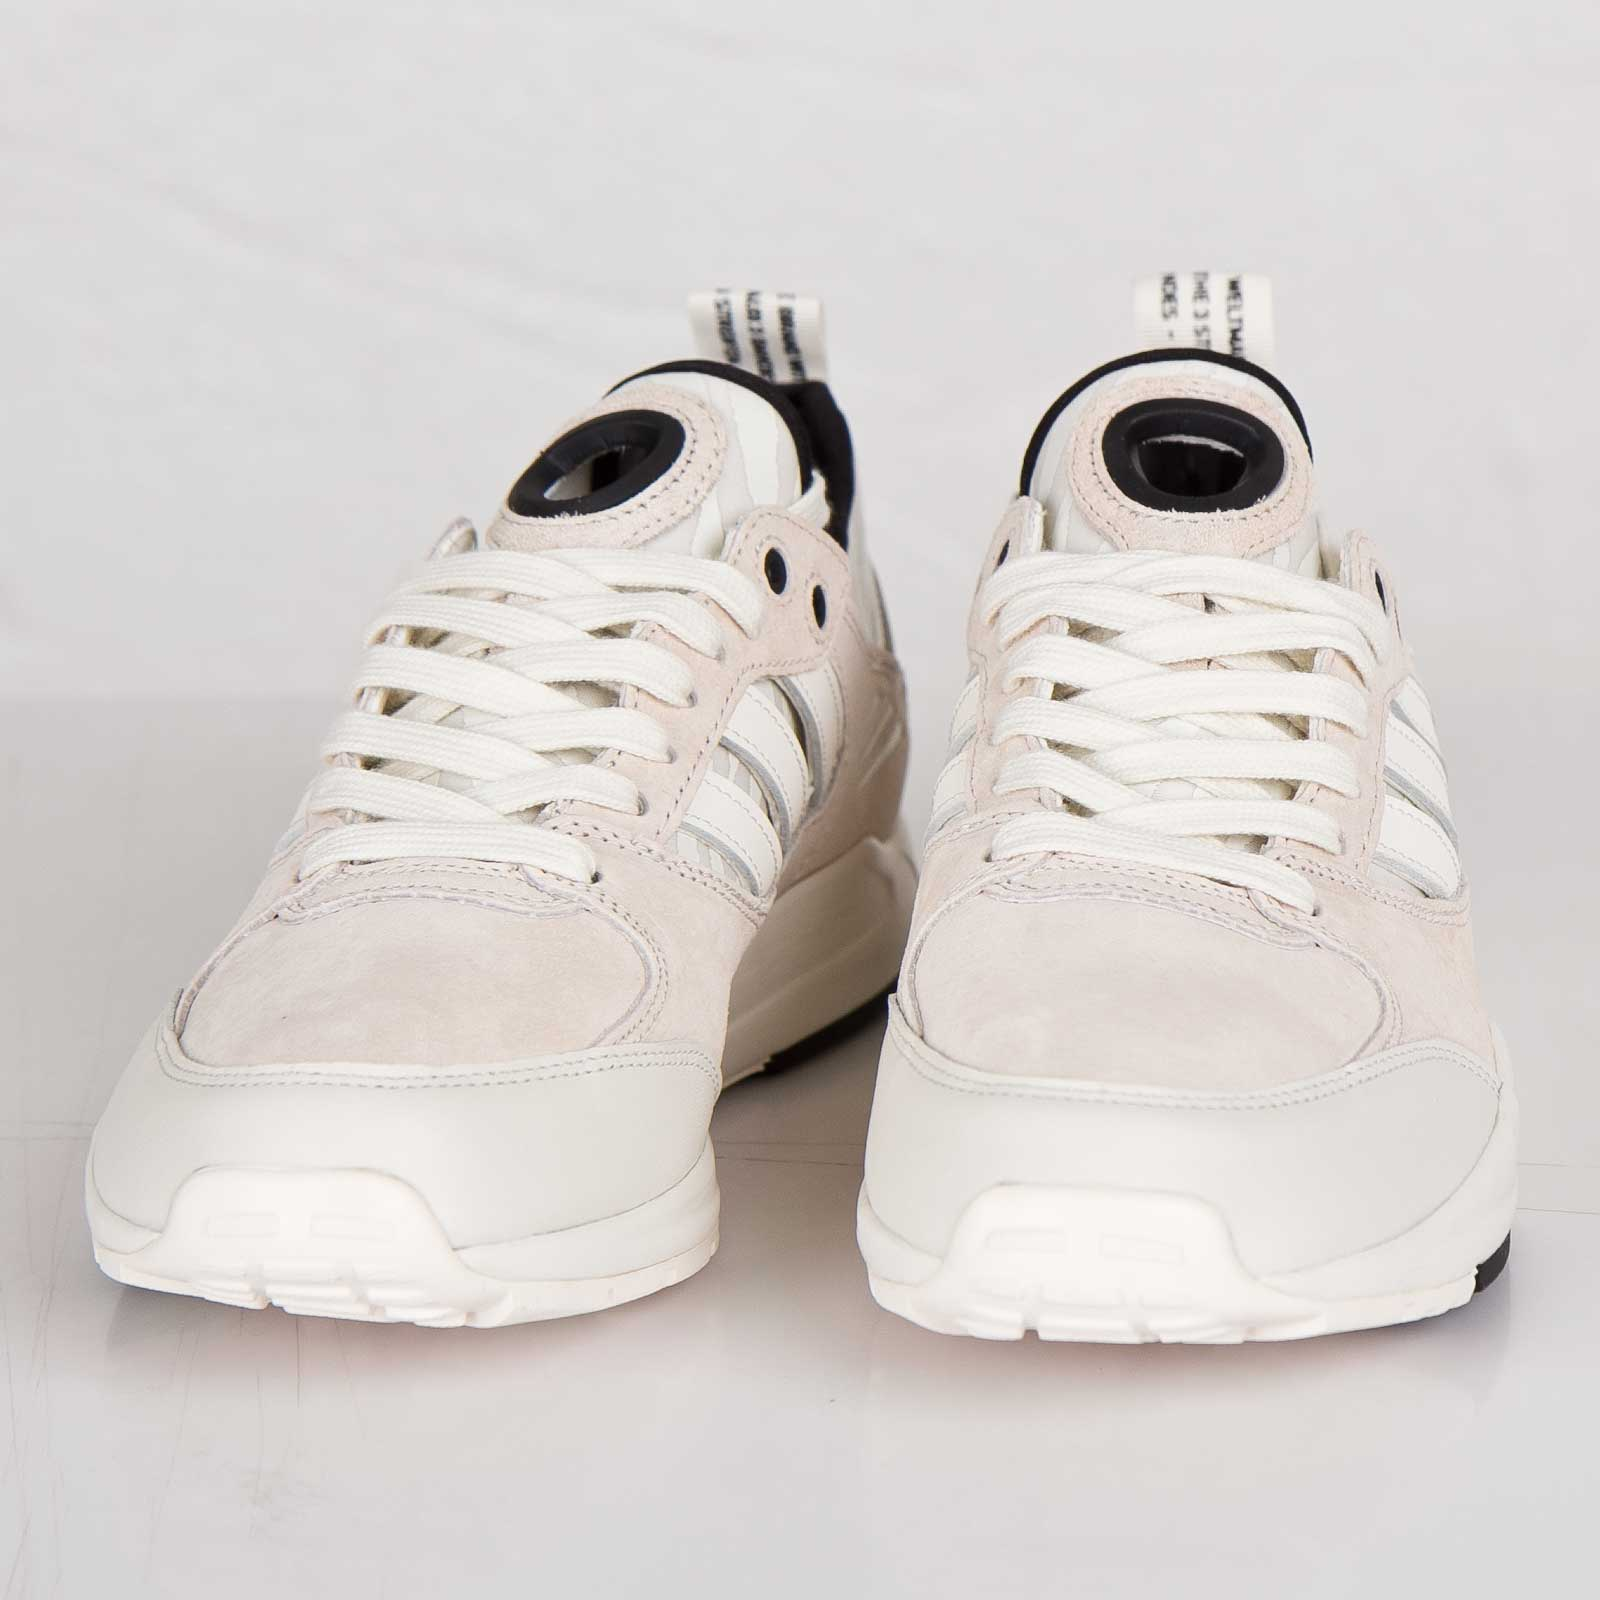 meilleur service 582c1 3bebb adidas Tech Super 2.0 - M25156 - Sneakersnstuff | sneakers ...